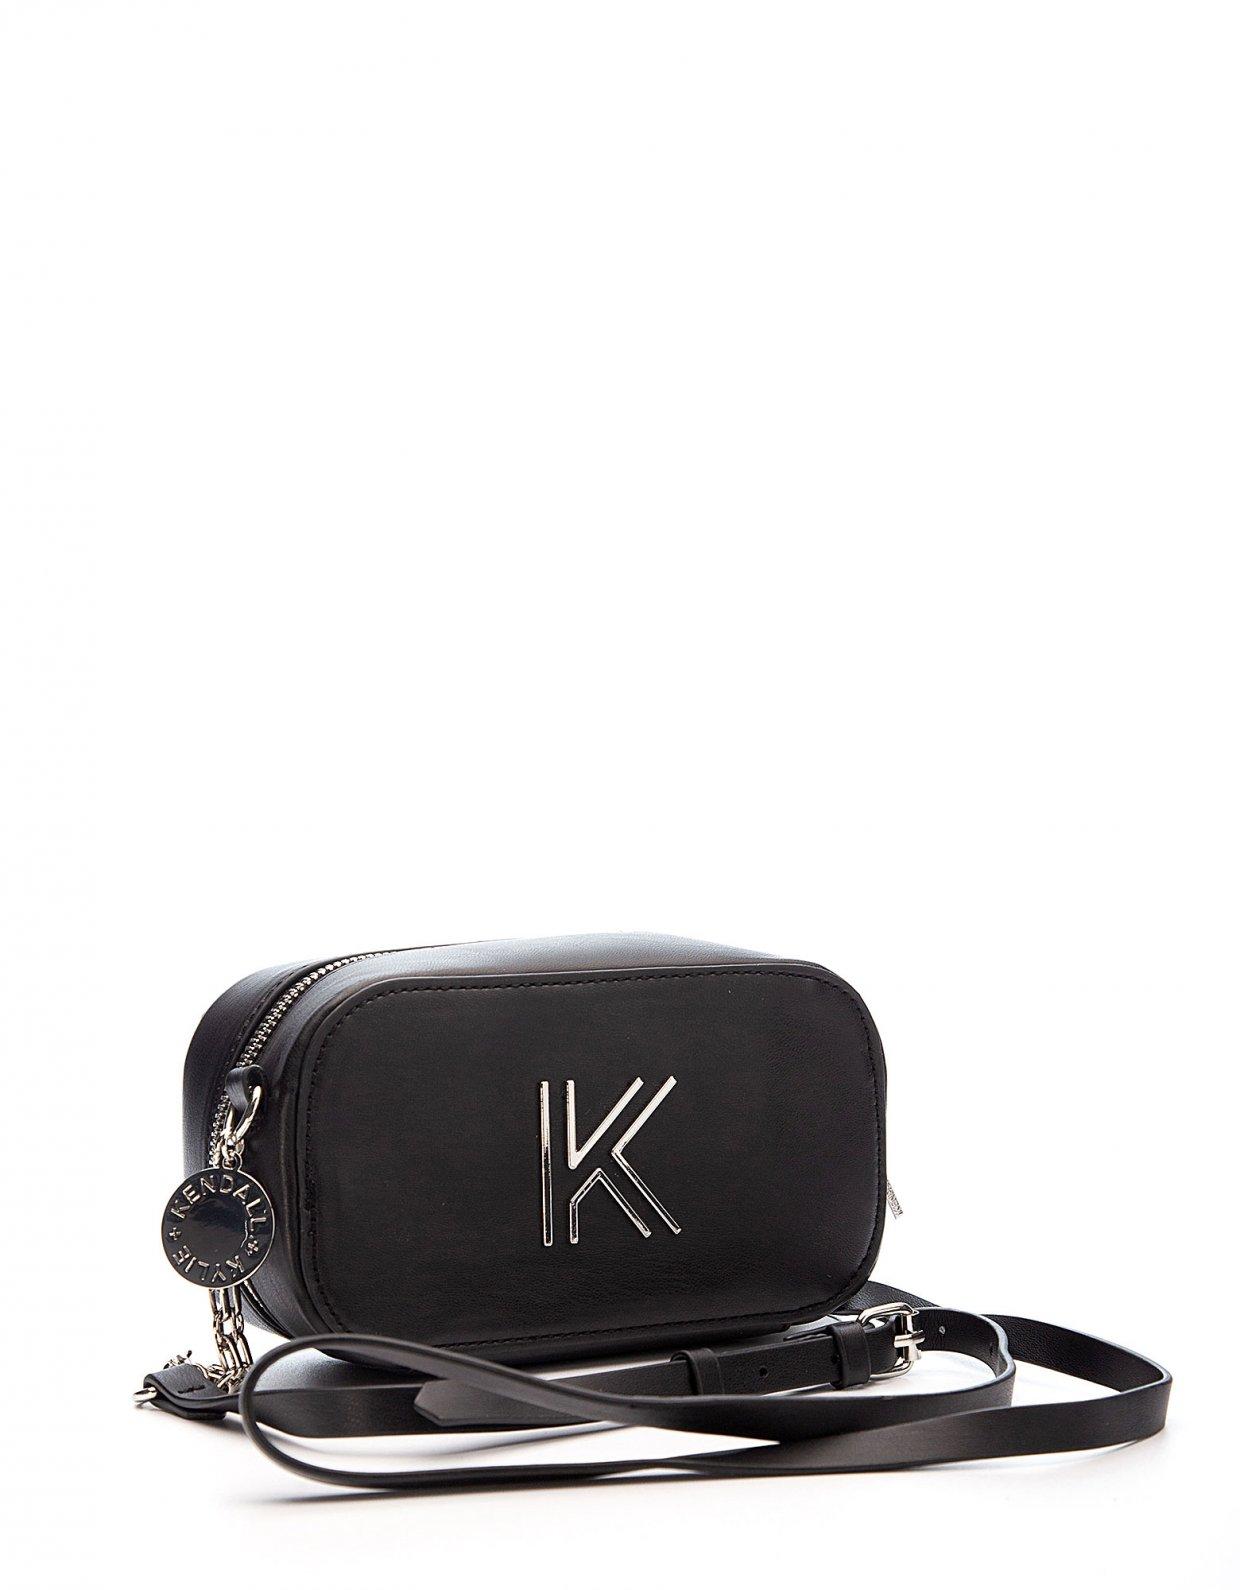 Kendall + Kylie Heather crossbody black